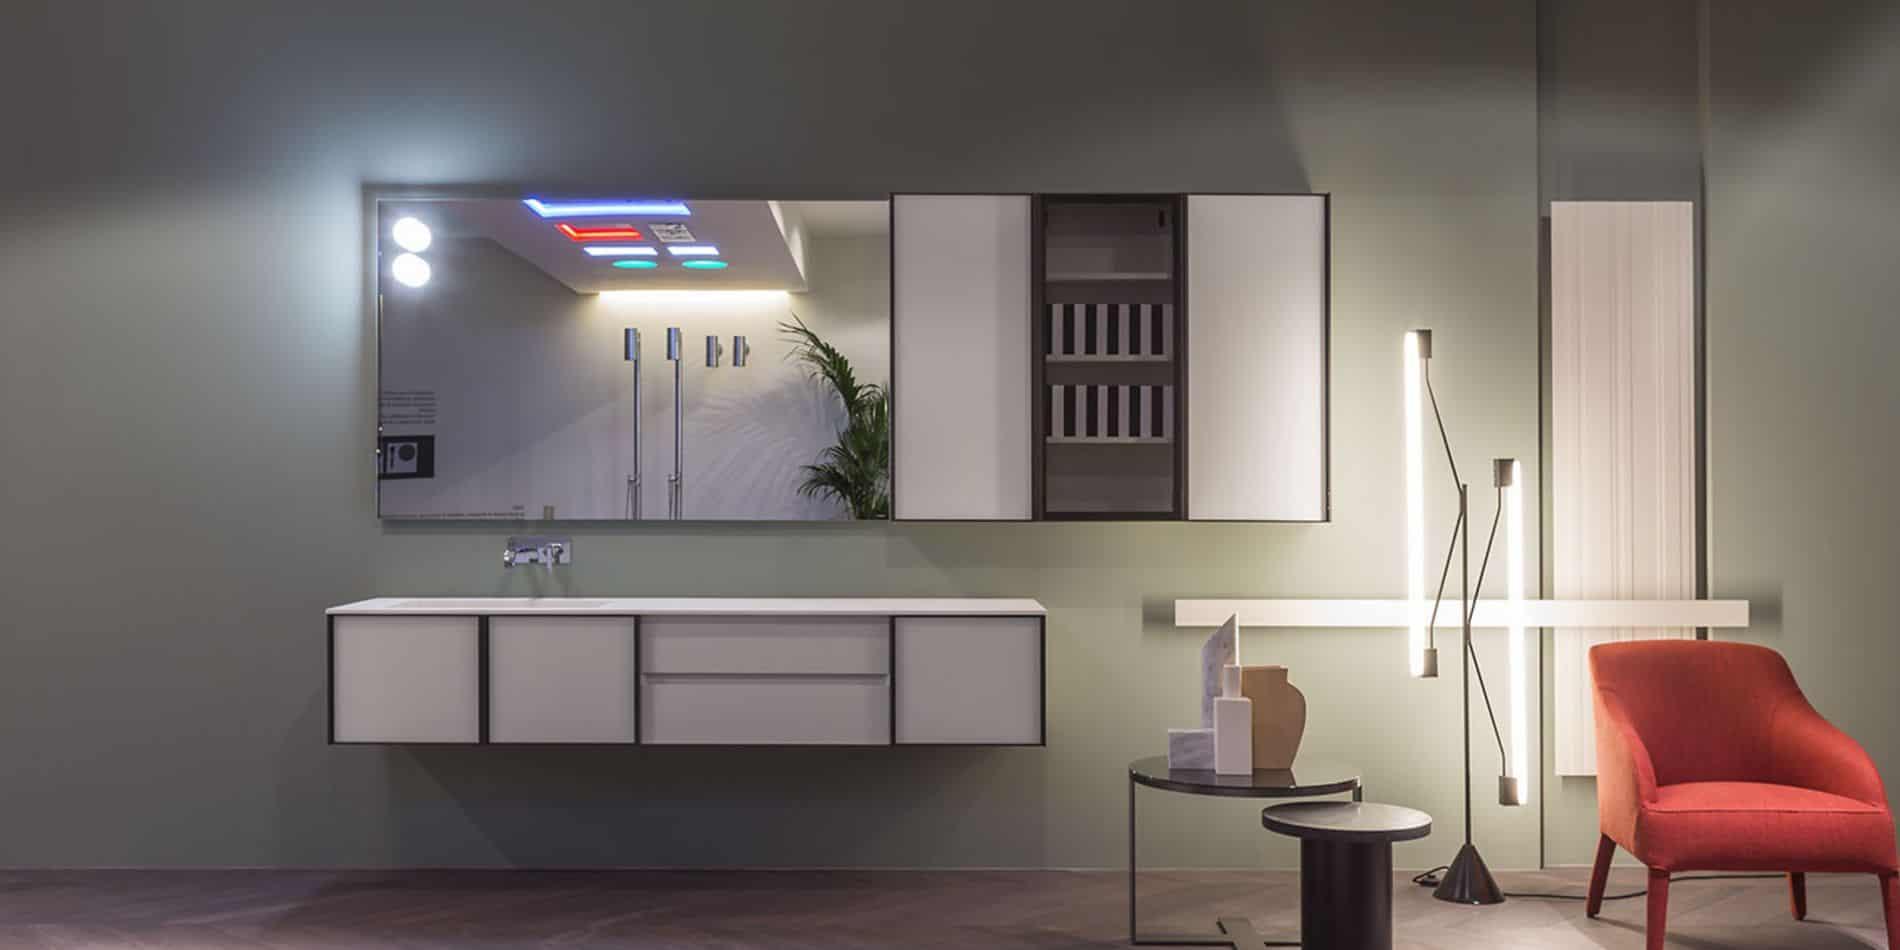 Bathroom Furniture Colection Bespoke from Antonio Lupi